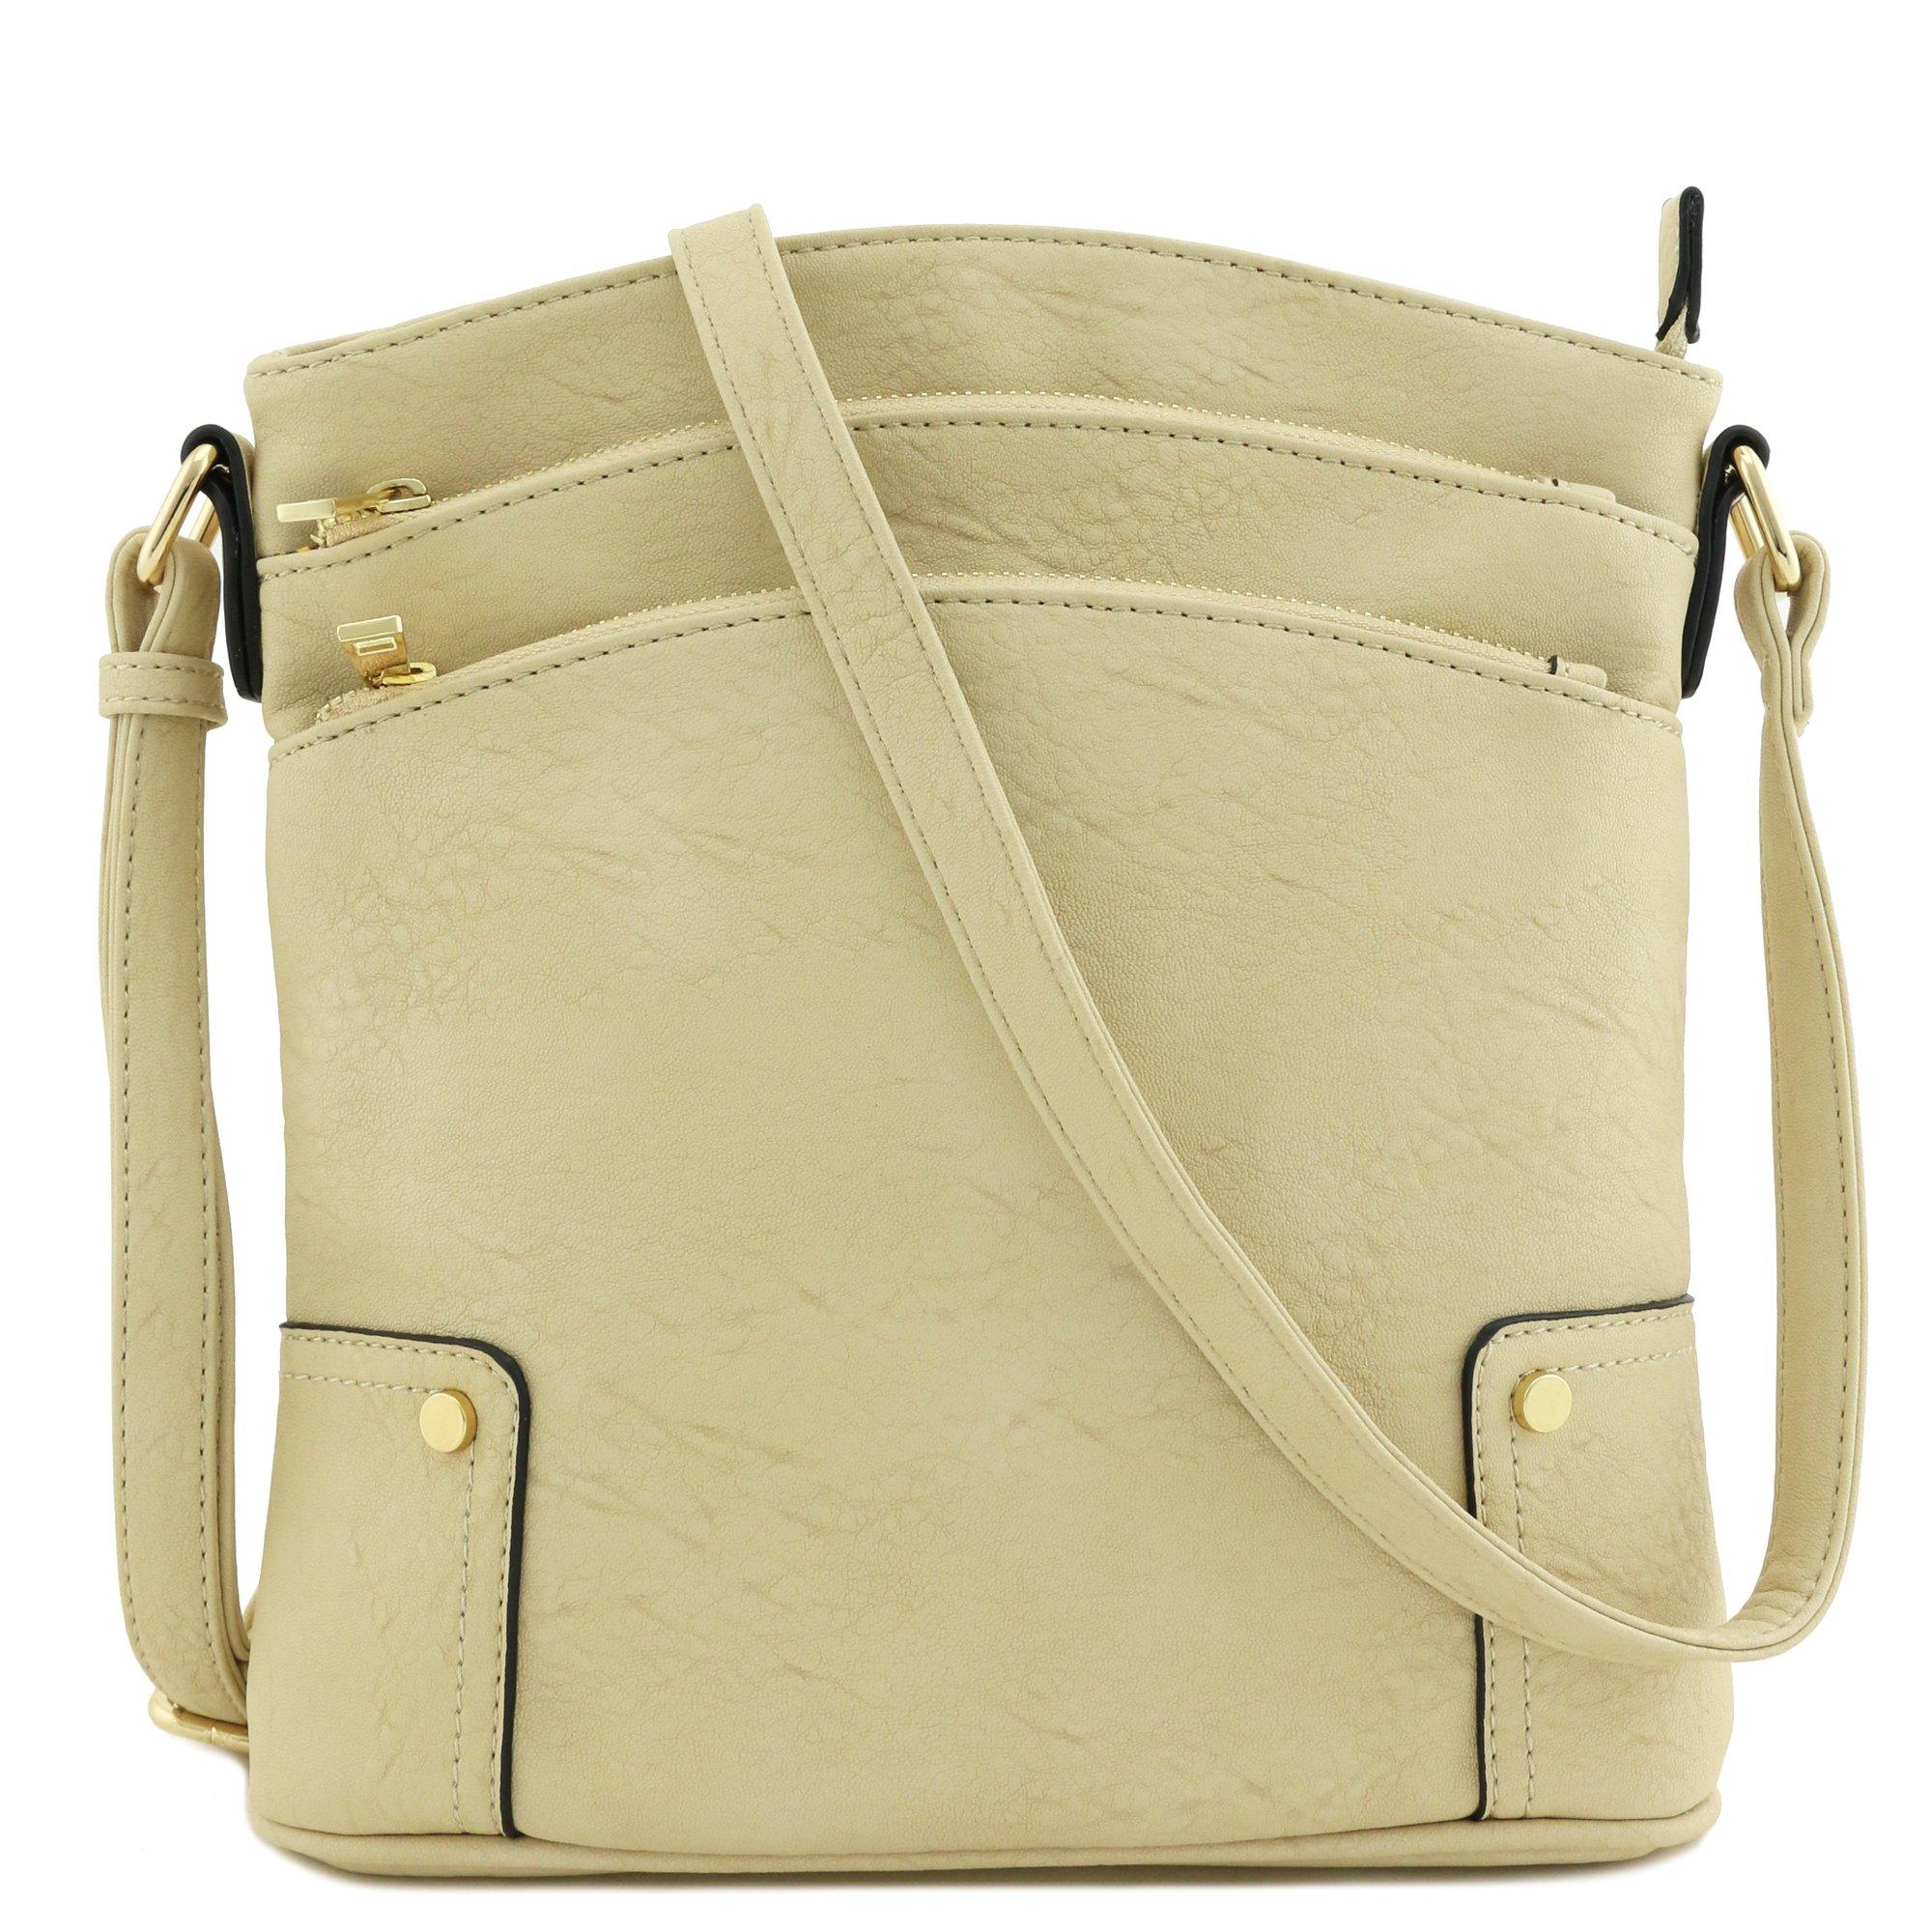 Triple Zip Pocket Large Crossbody Bag (Beige) by Alyssa